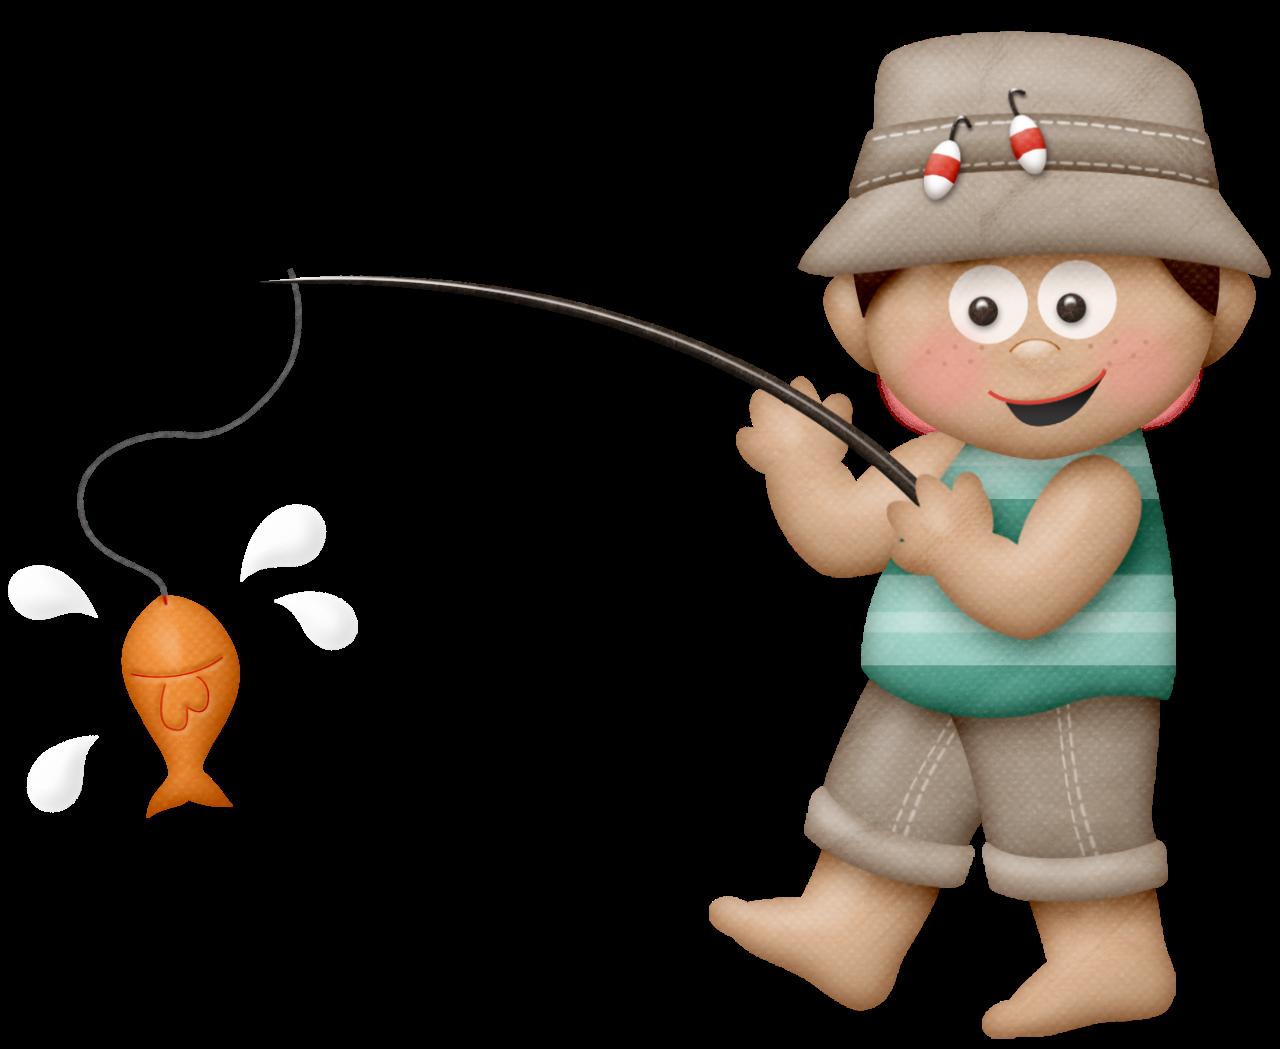 Lliella fishingadv fishingboy png. Hiker clipart adventurous girl